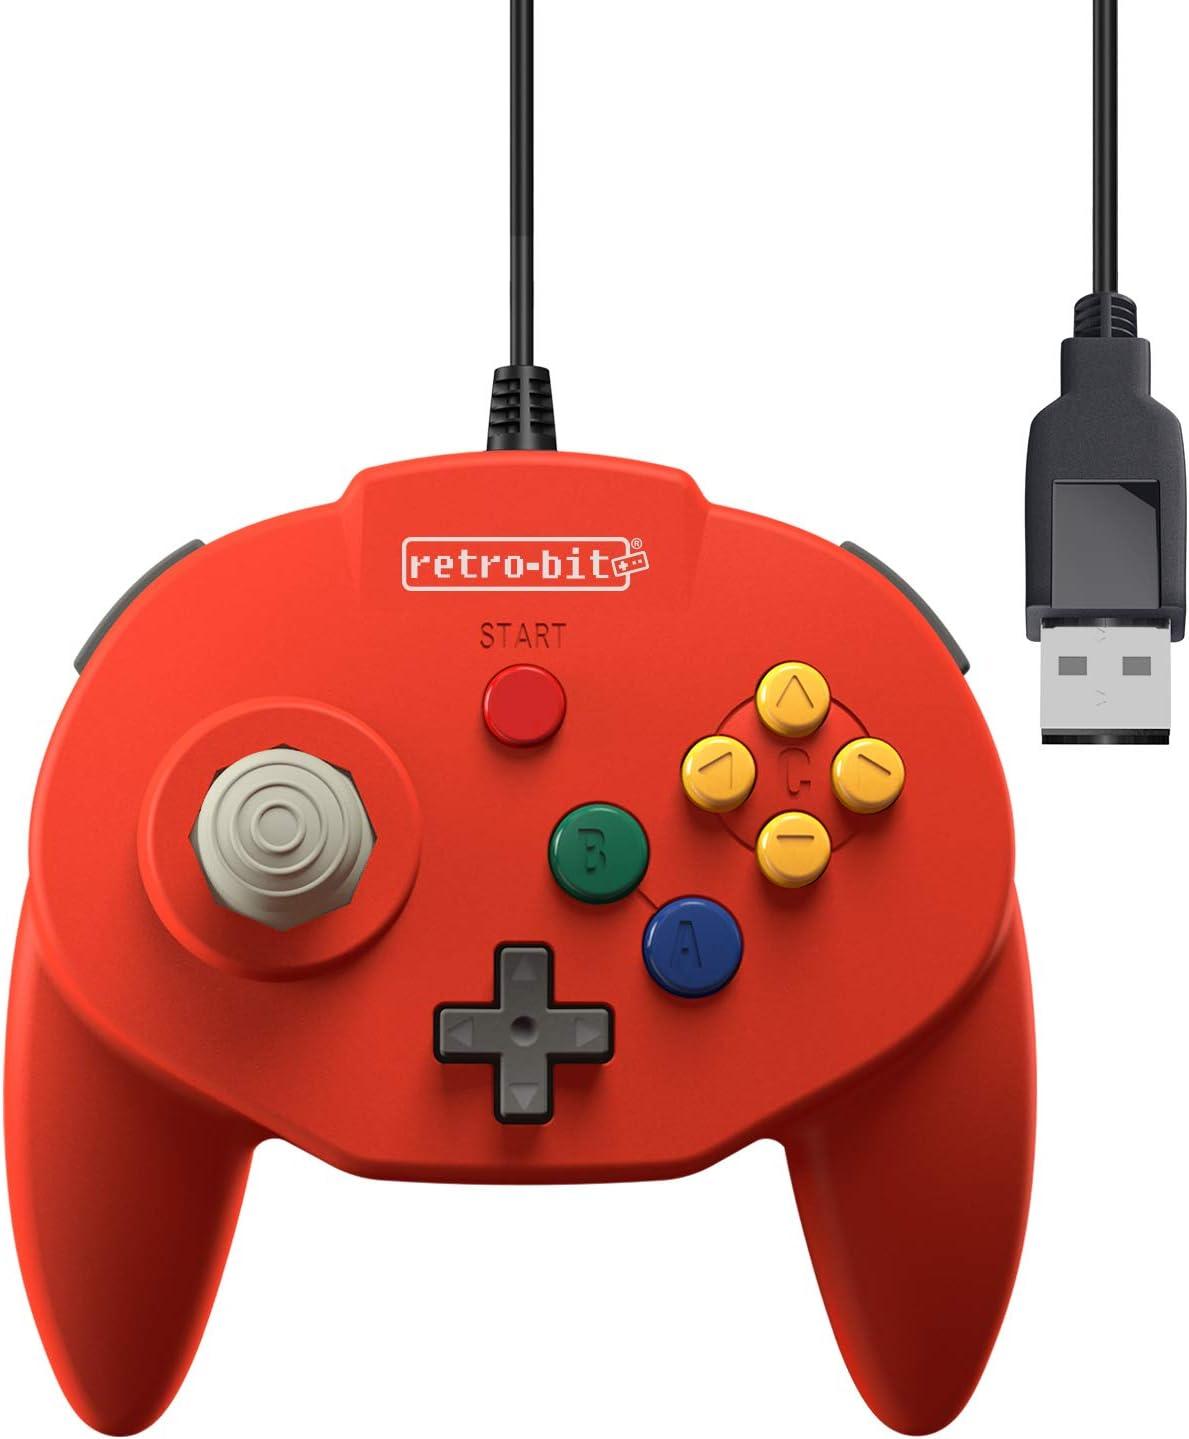 Retro-Bit Tribute 64 USB Controller for PC, Switch, Mac, Steam, RetroPie, Raspberry Pi - USB Port - (Red)